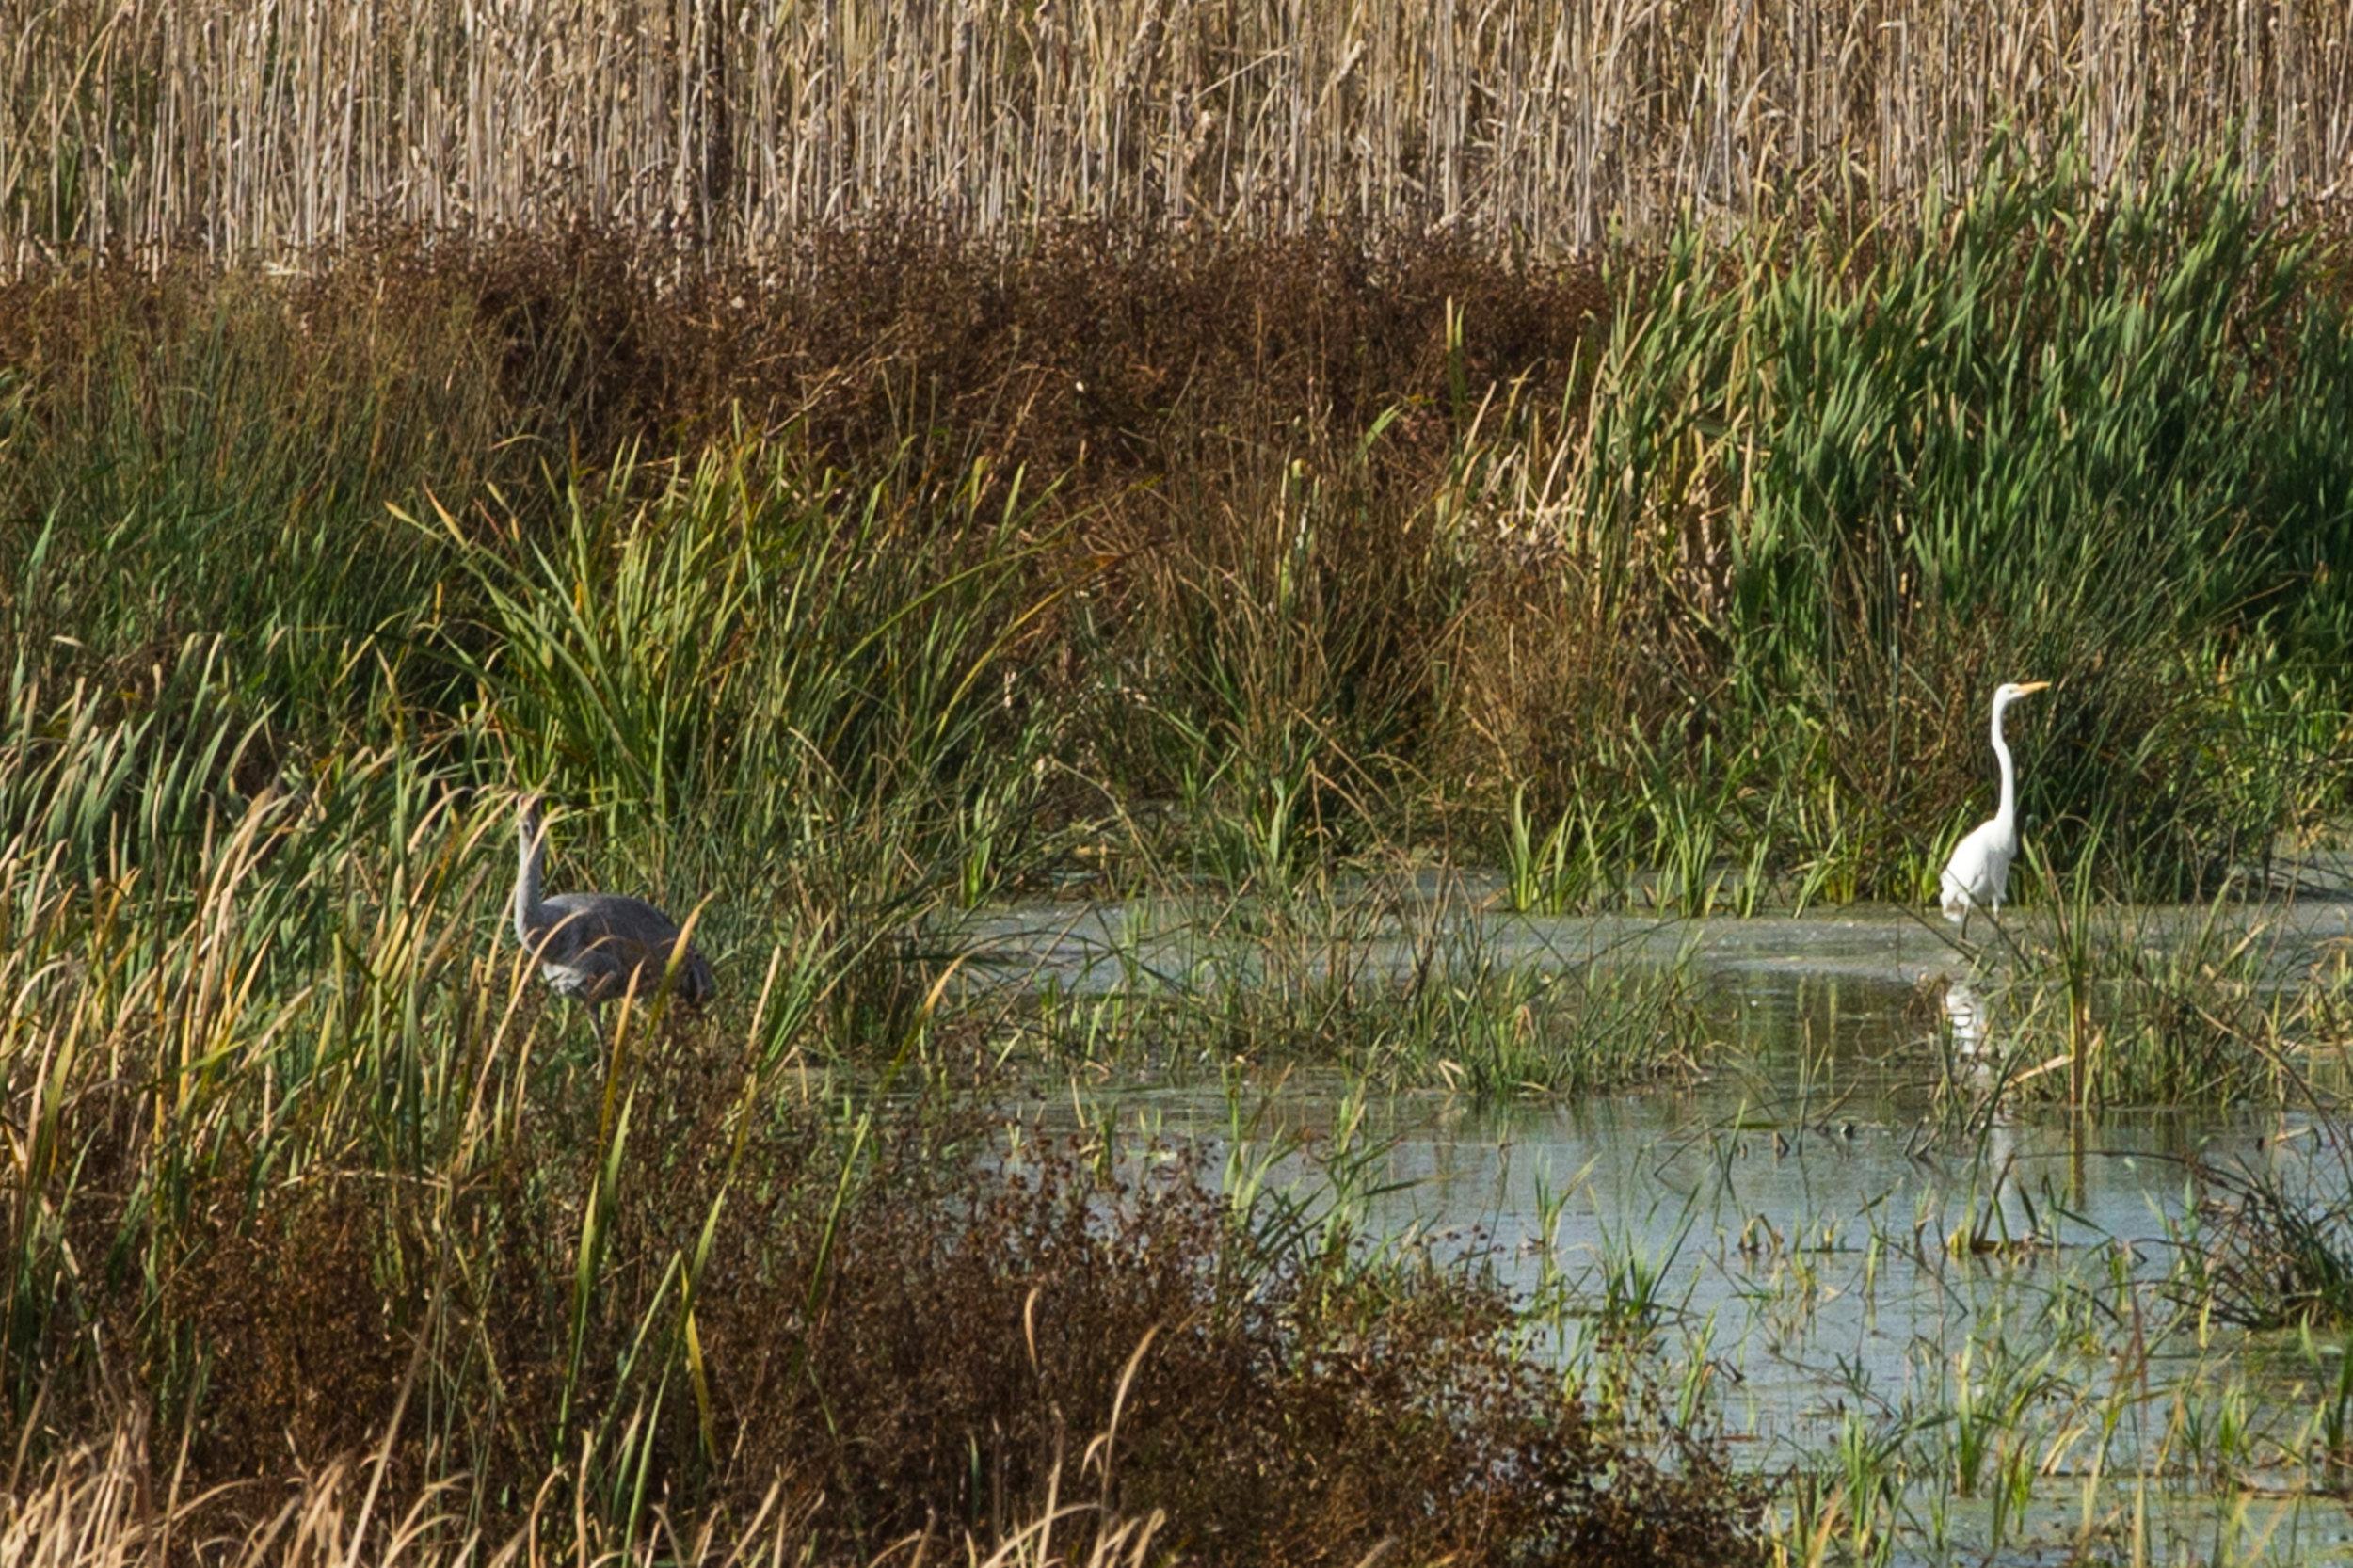 Dixon Waterfowl Refuge